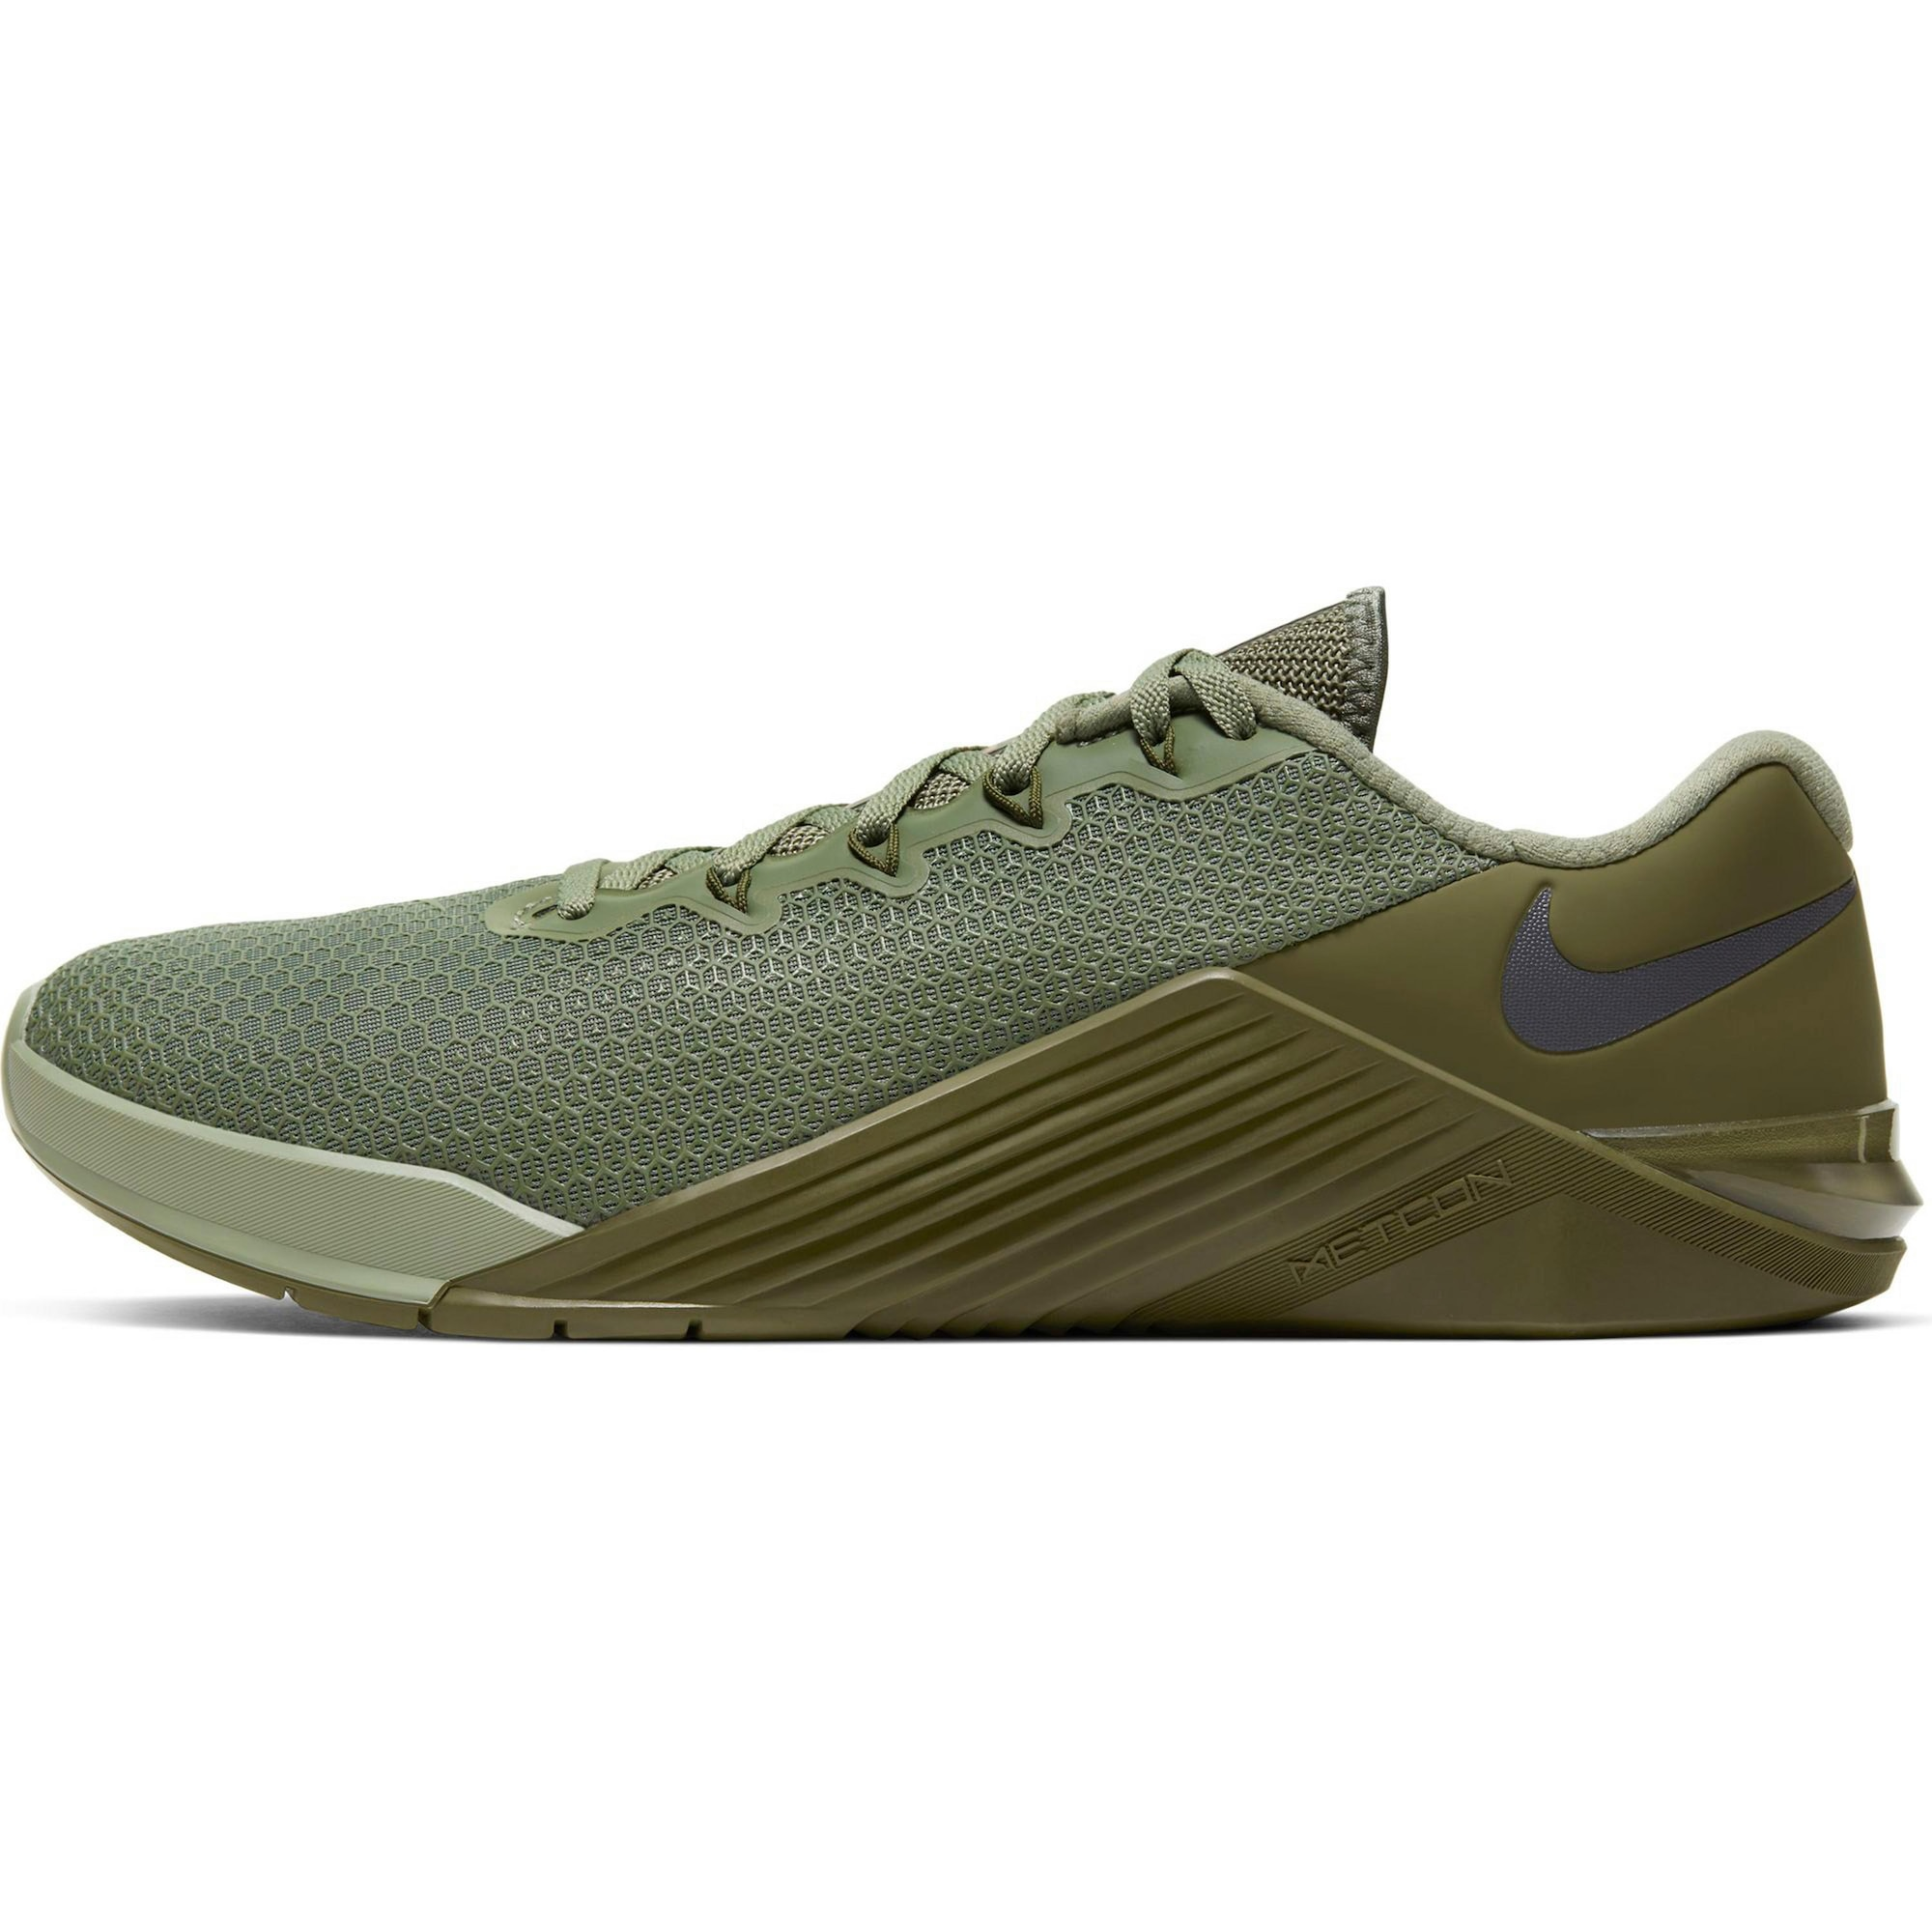 Fitnessschuh 'Metcon 5' | Schuhe > Sportschuhe > Fitnessschuhe | Nike